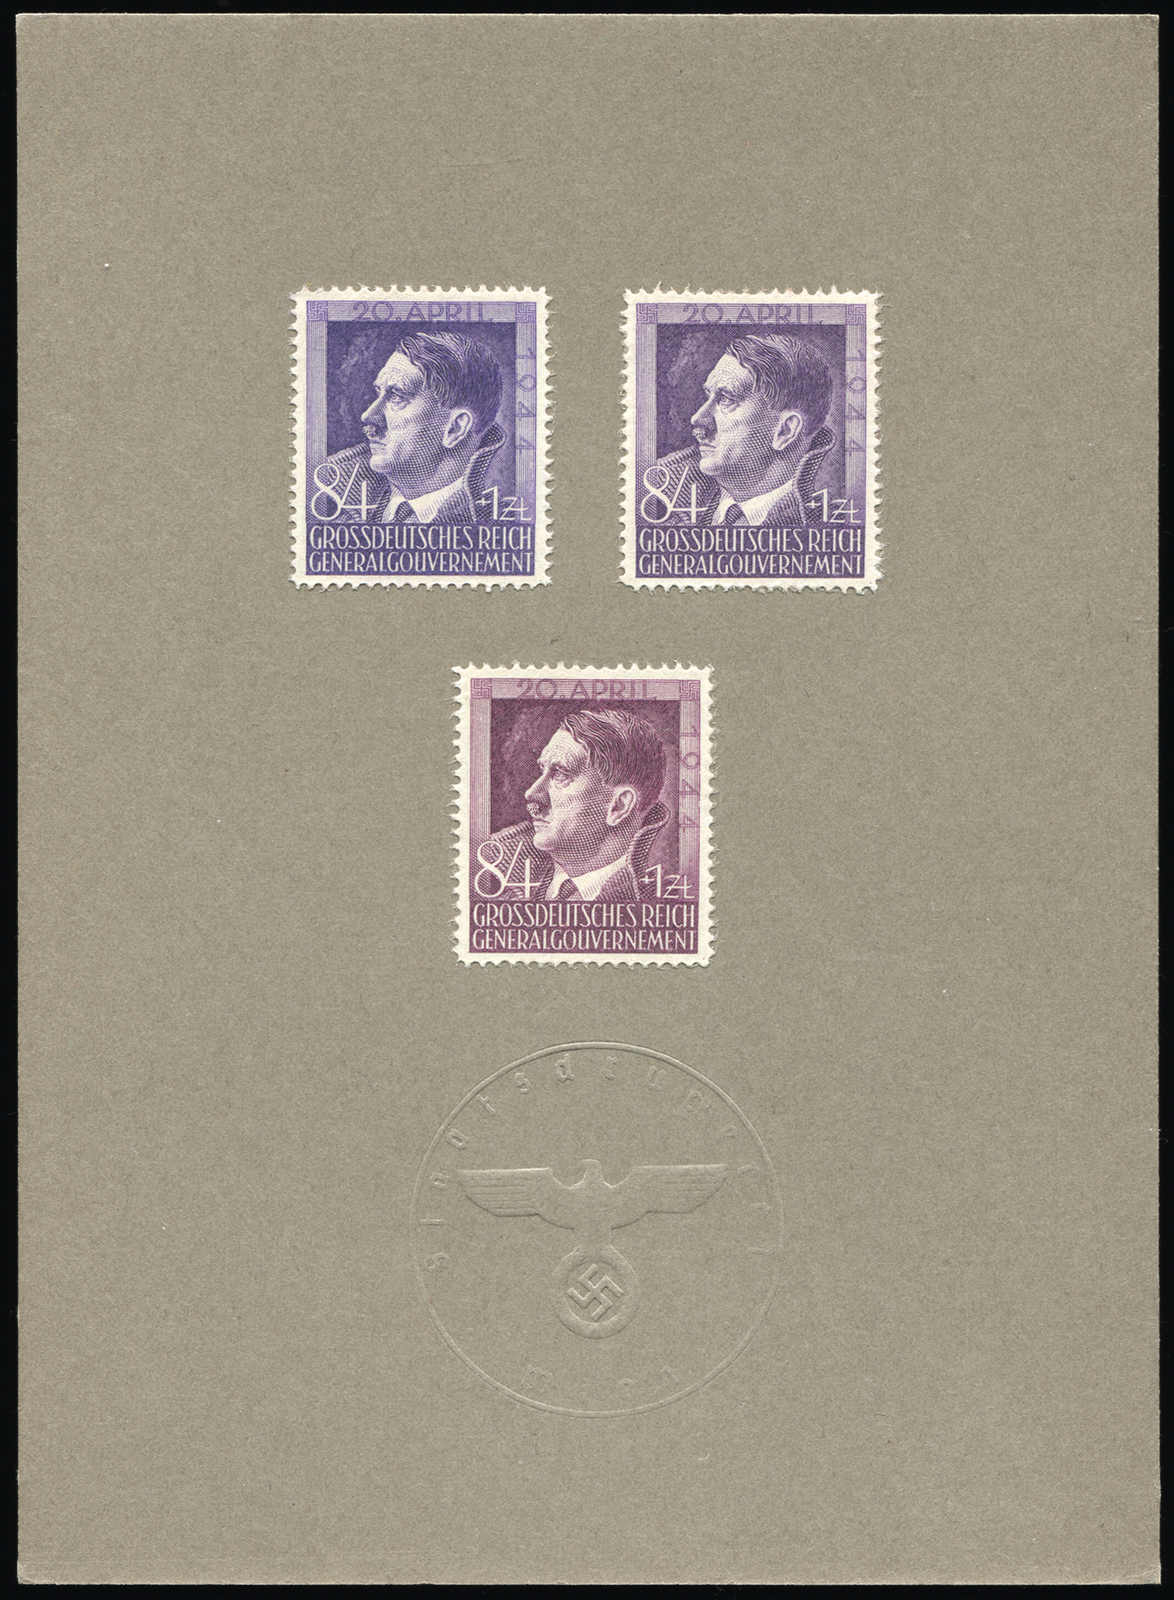 Lot 2 - Special Catalogue